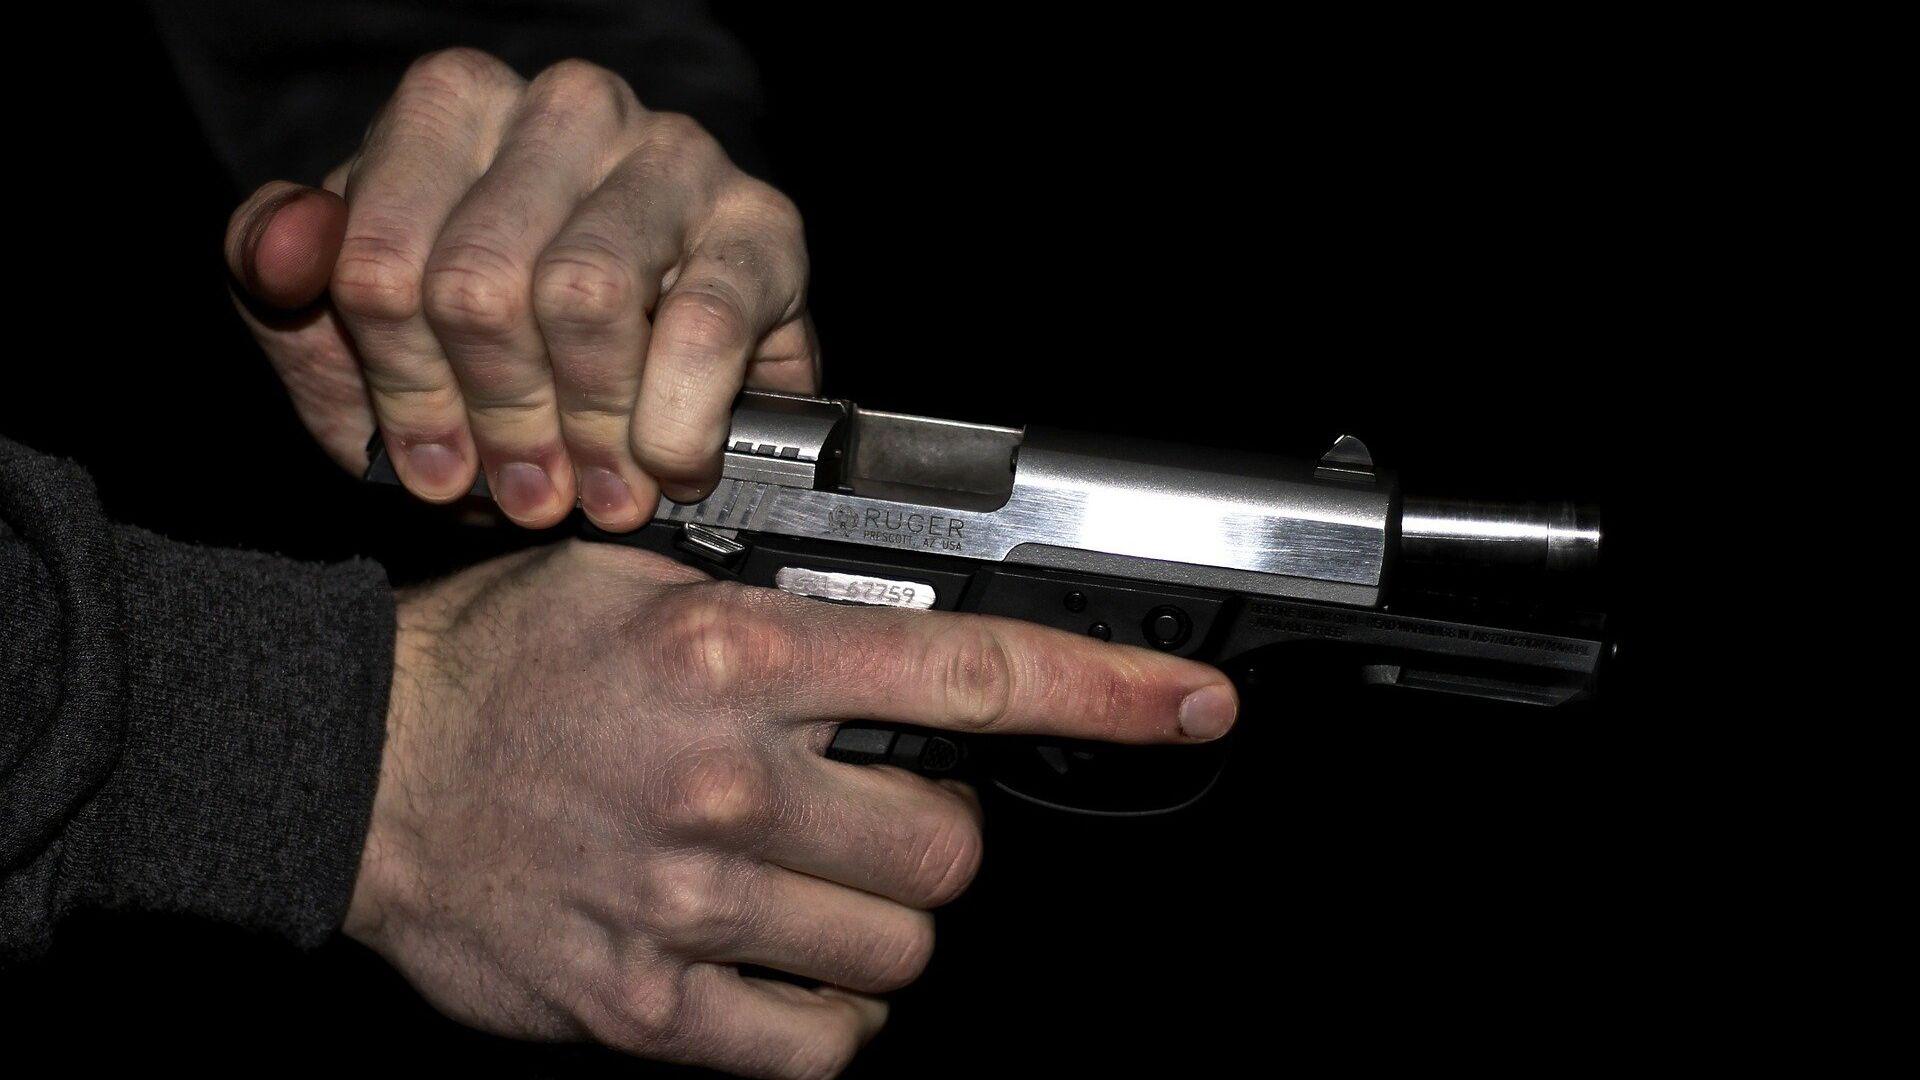 Una pistola (imagen referencial) - Sputnik Mundo, 1920, 18.02.2021